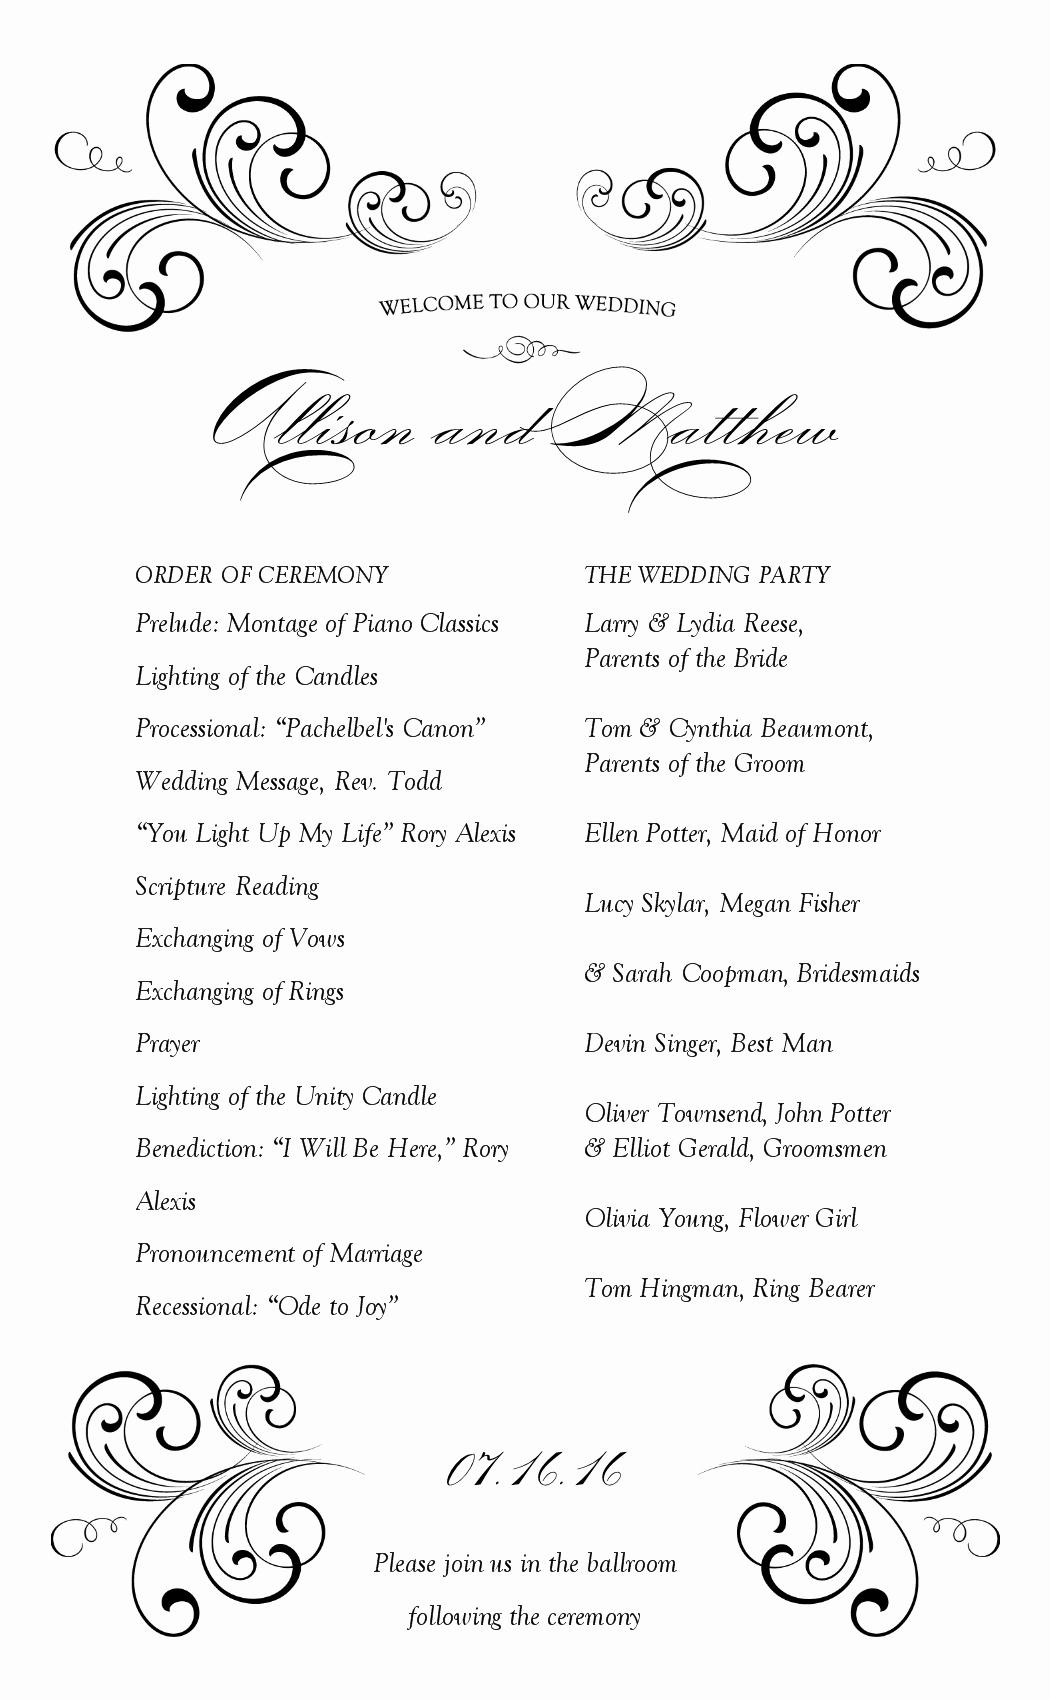 Wedding Reception Program Example Luxury Sample Wedding Programme at the Reception